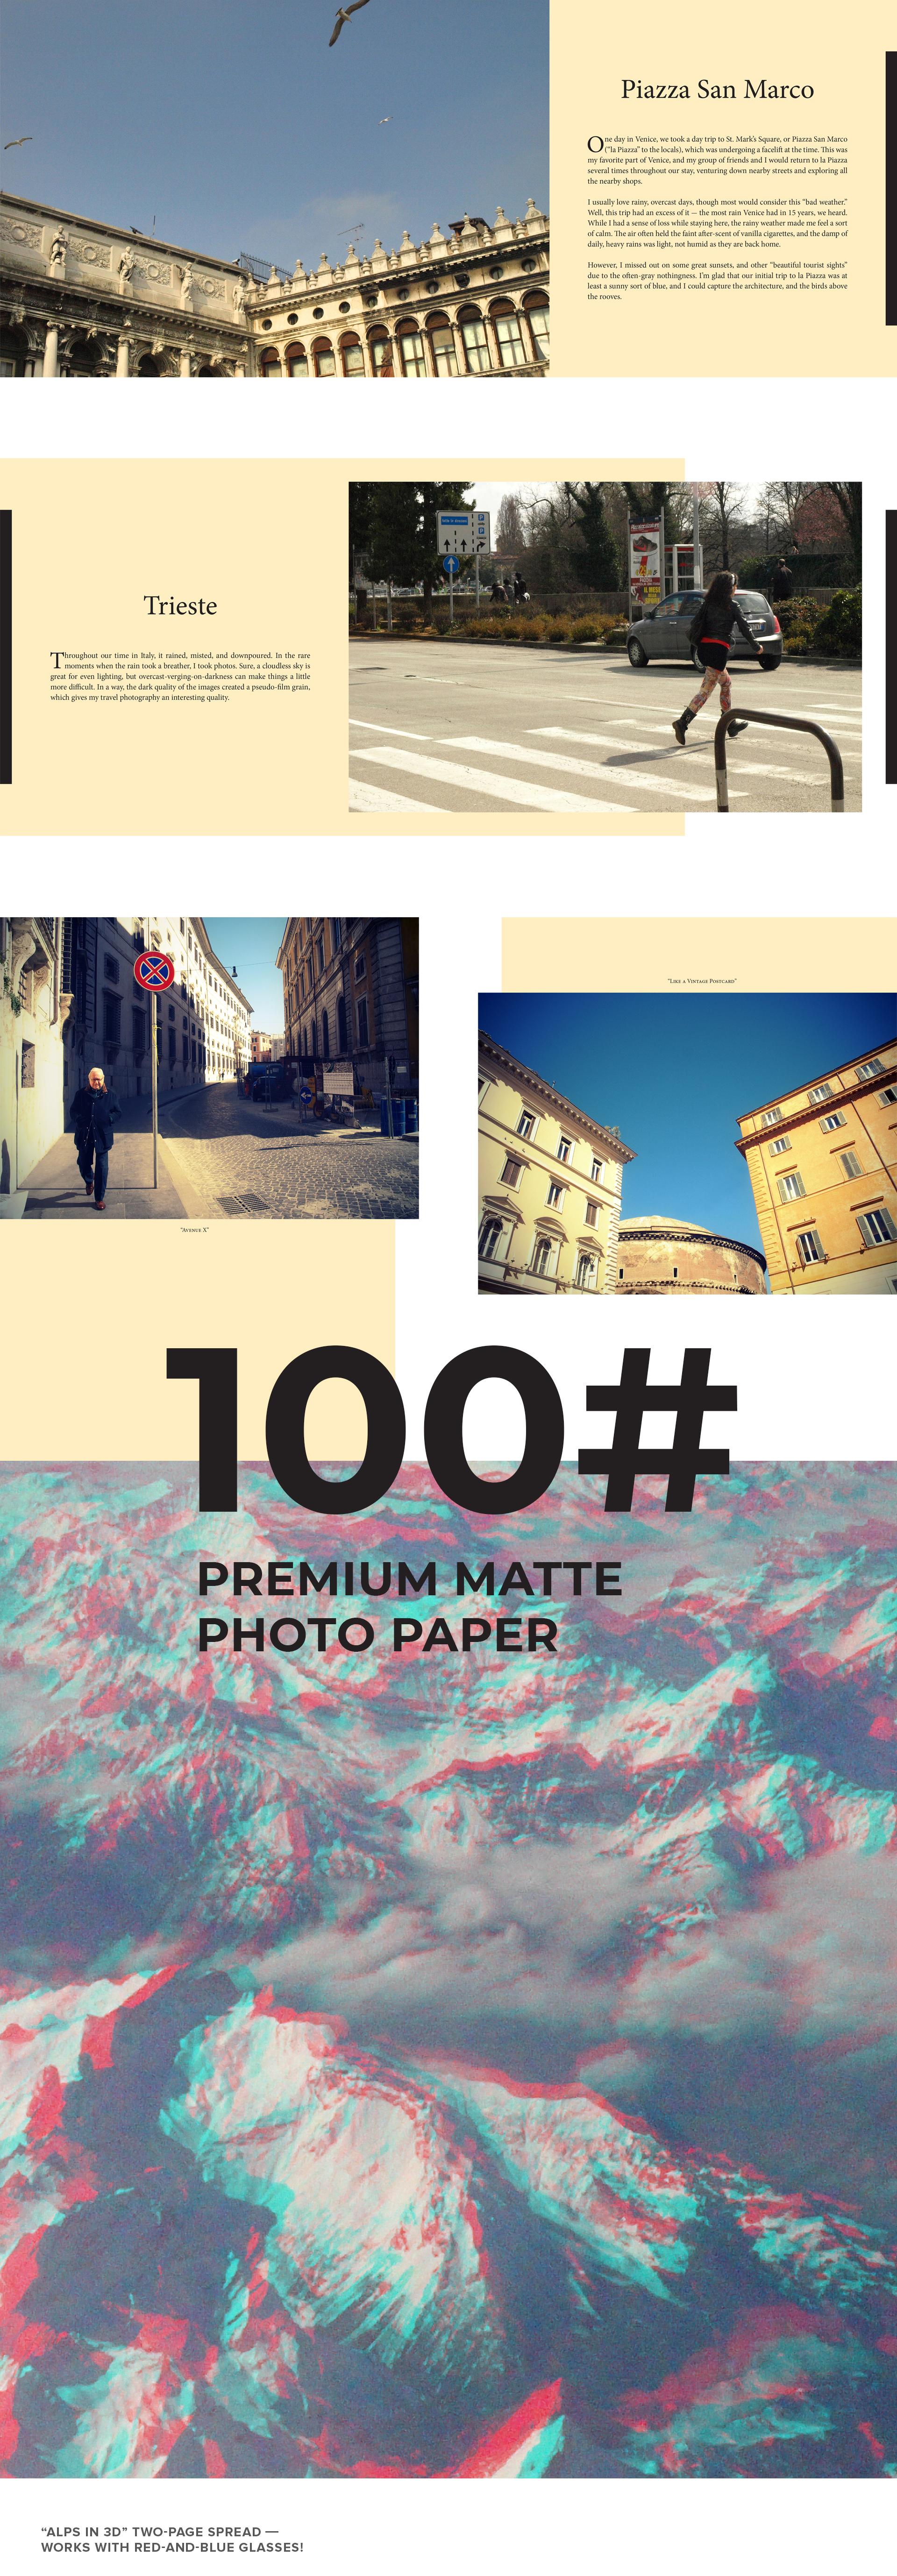 GeenaMatuson_TheGirlMirage_Trip-to-Italy_Book_04.jpg